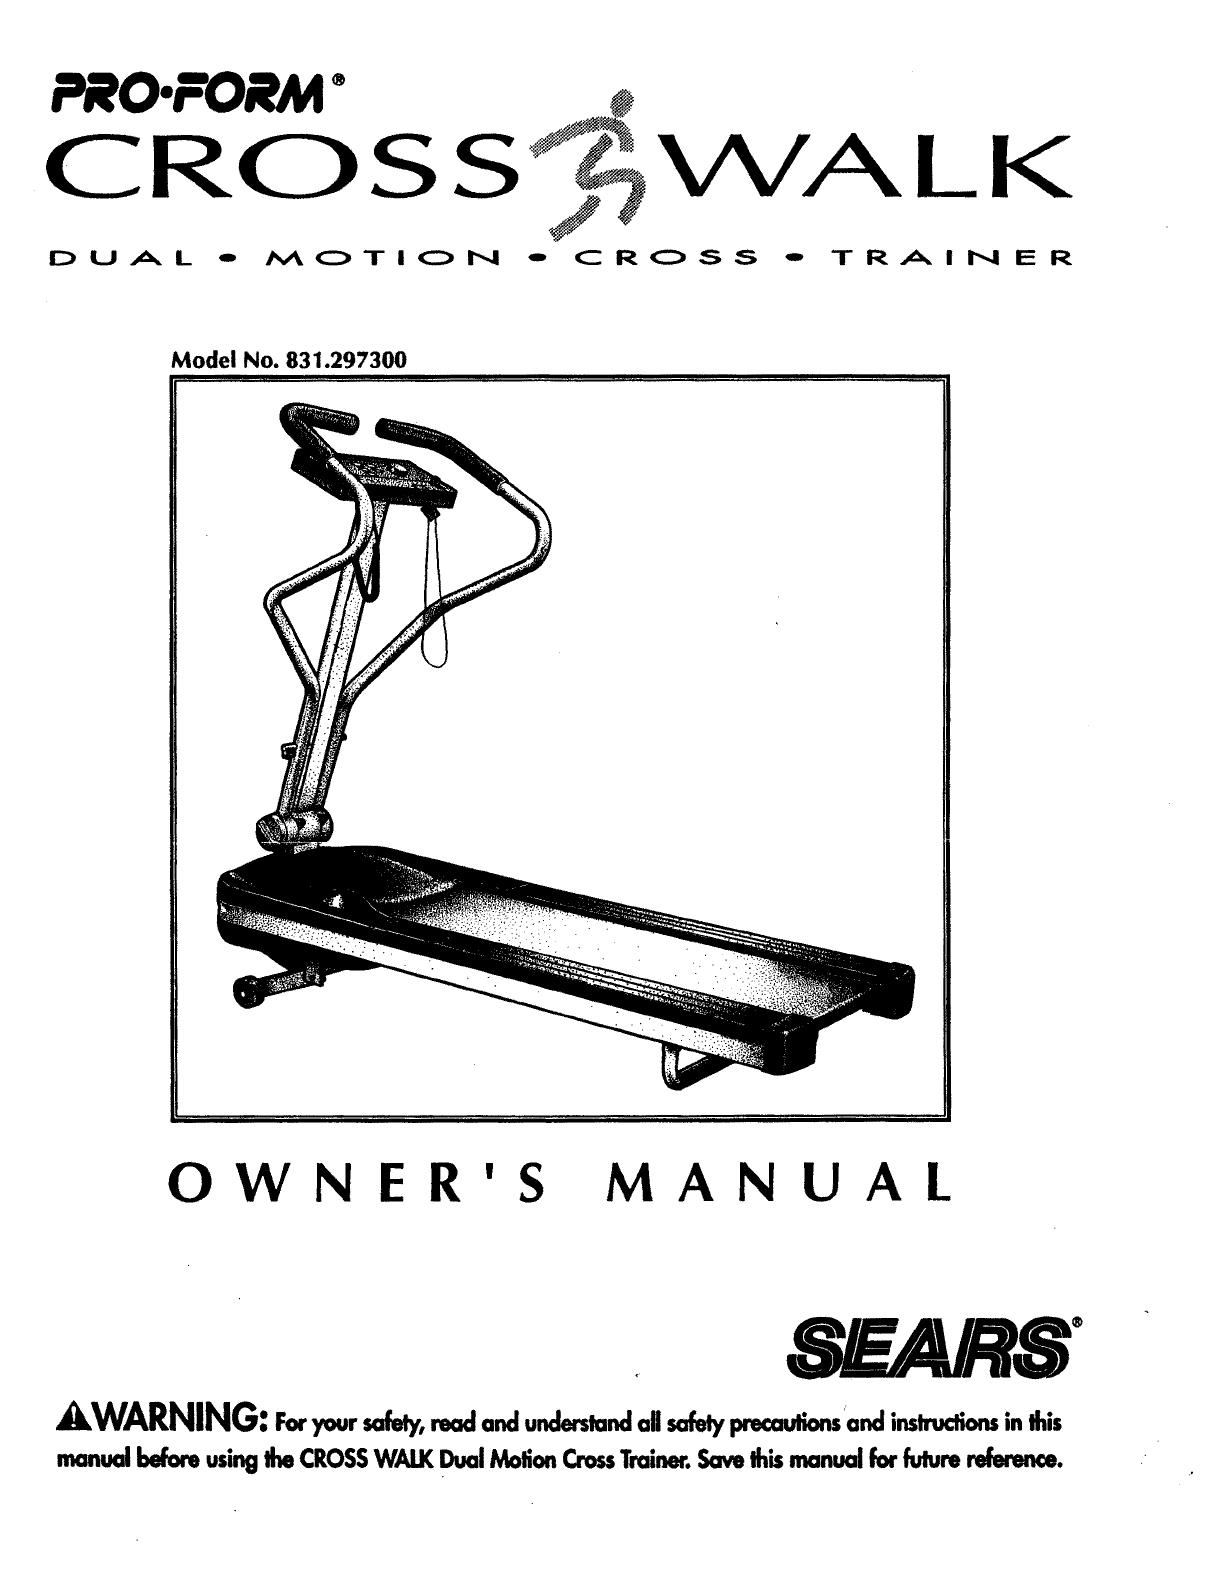 Proform 831297300 User Manual CROSSWALK PLUS TREADMILL Manuals And